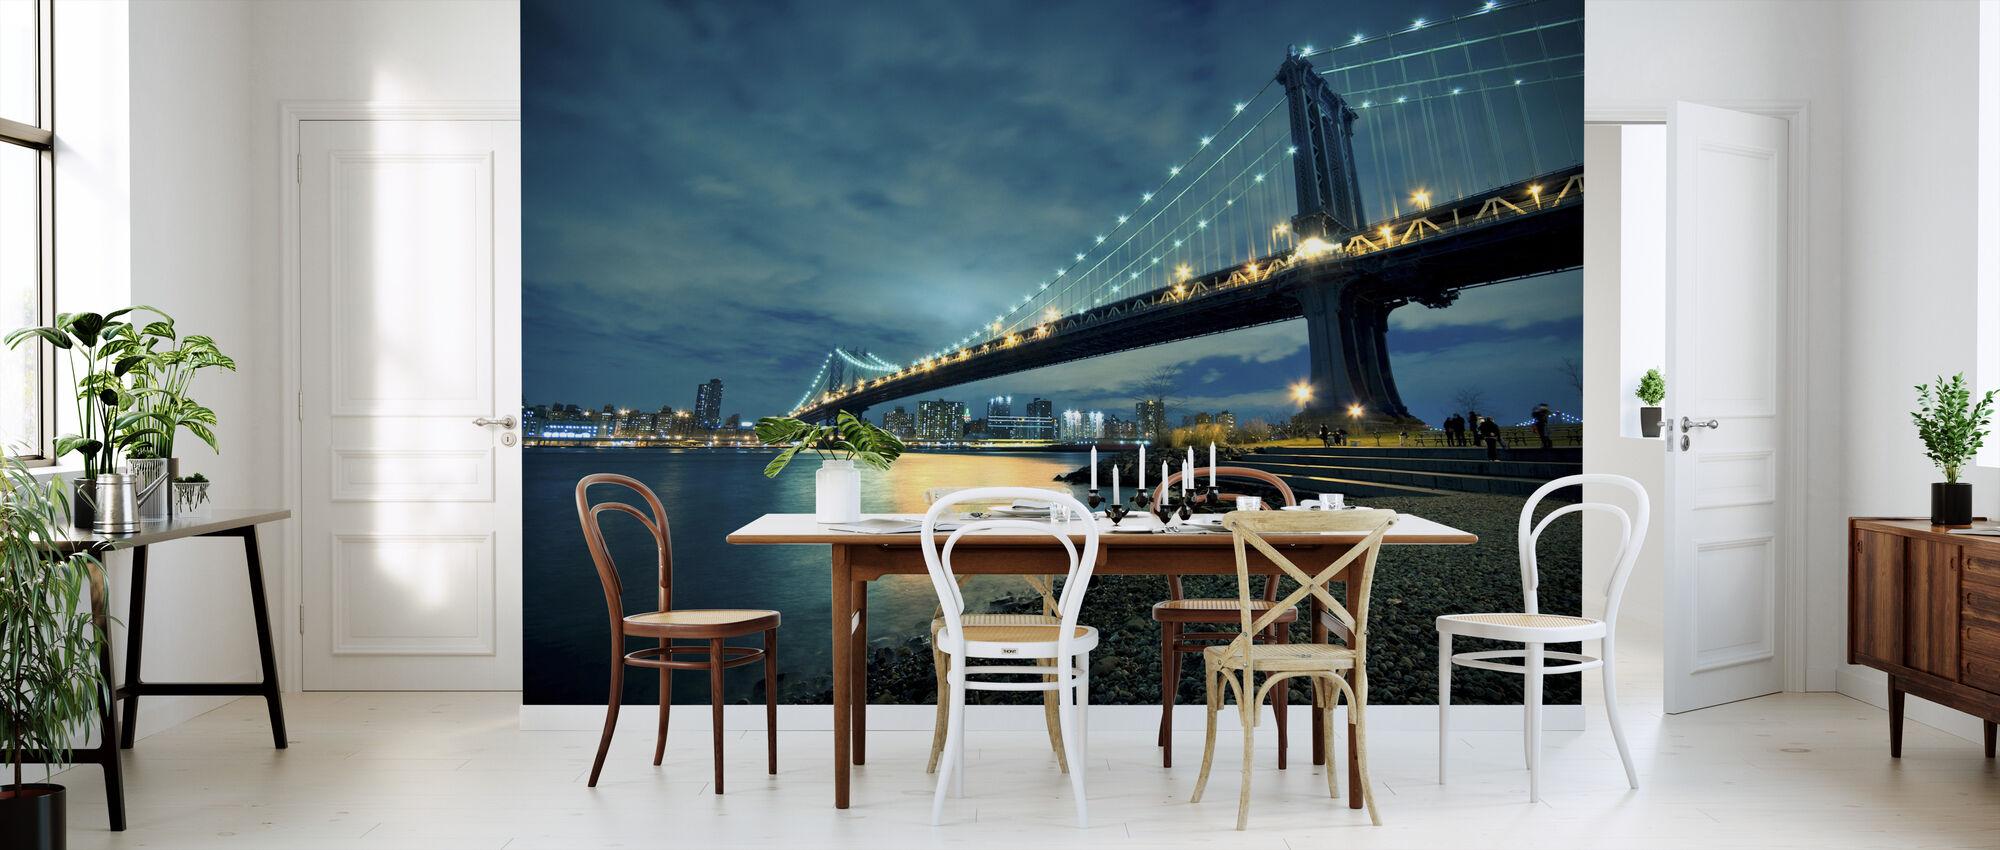 Manhattan Bridge Glowing at Night - Wallpaper - Kitchen